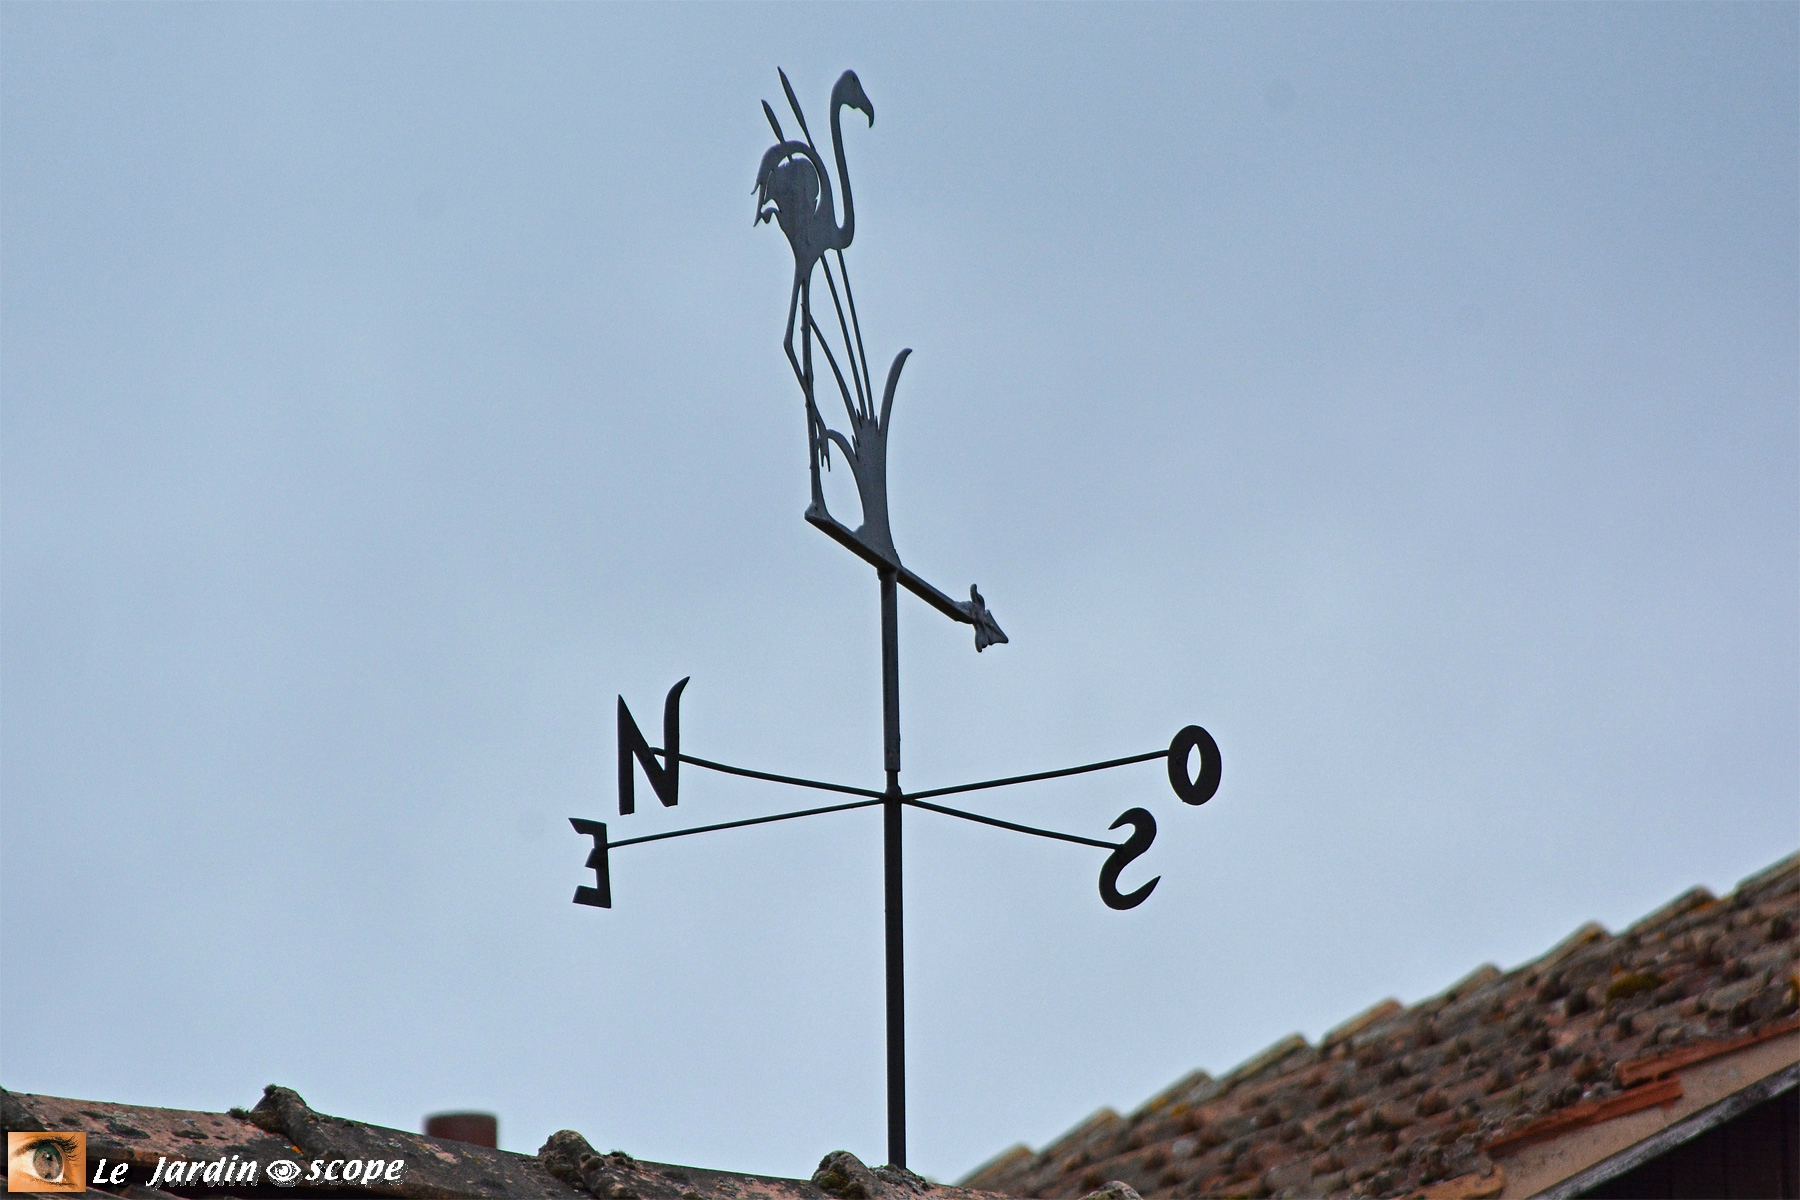 Girouette : Toutes Les Photos Sur Girouette - Le ... encequiconcerne Girouette De Jardin